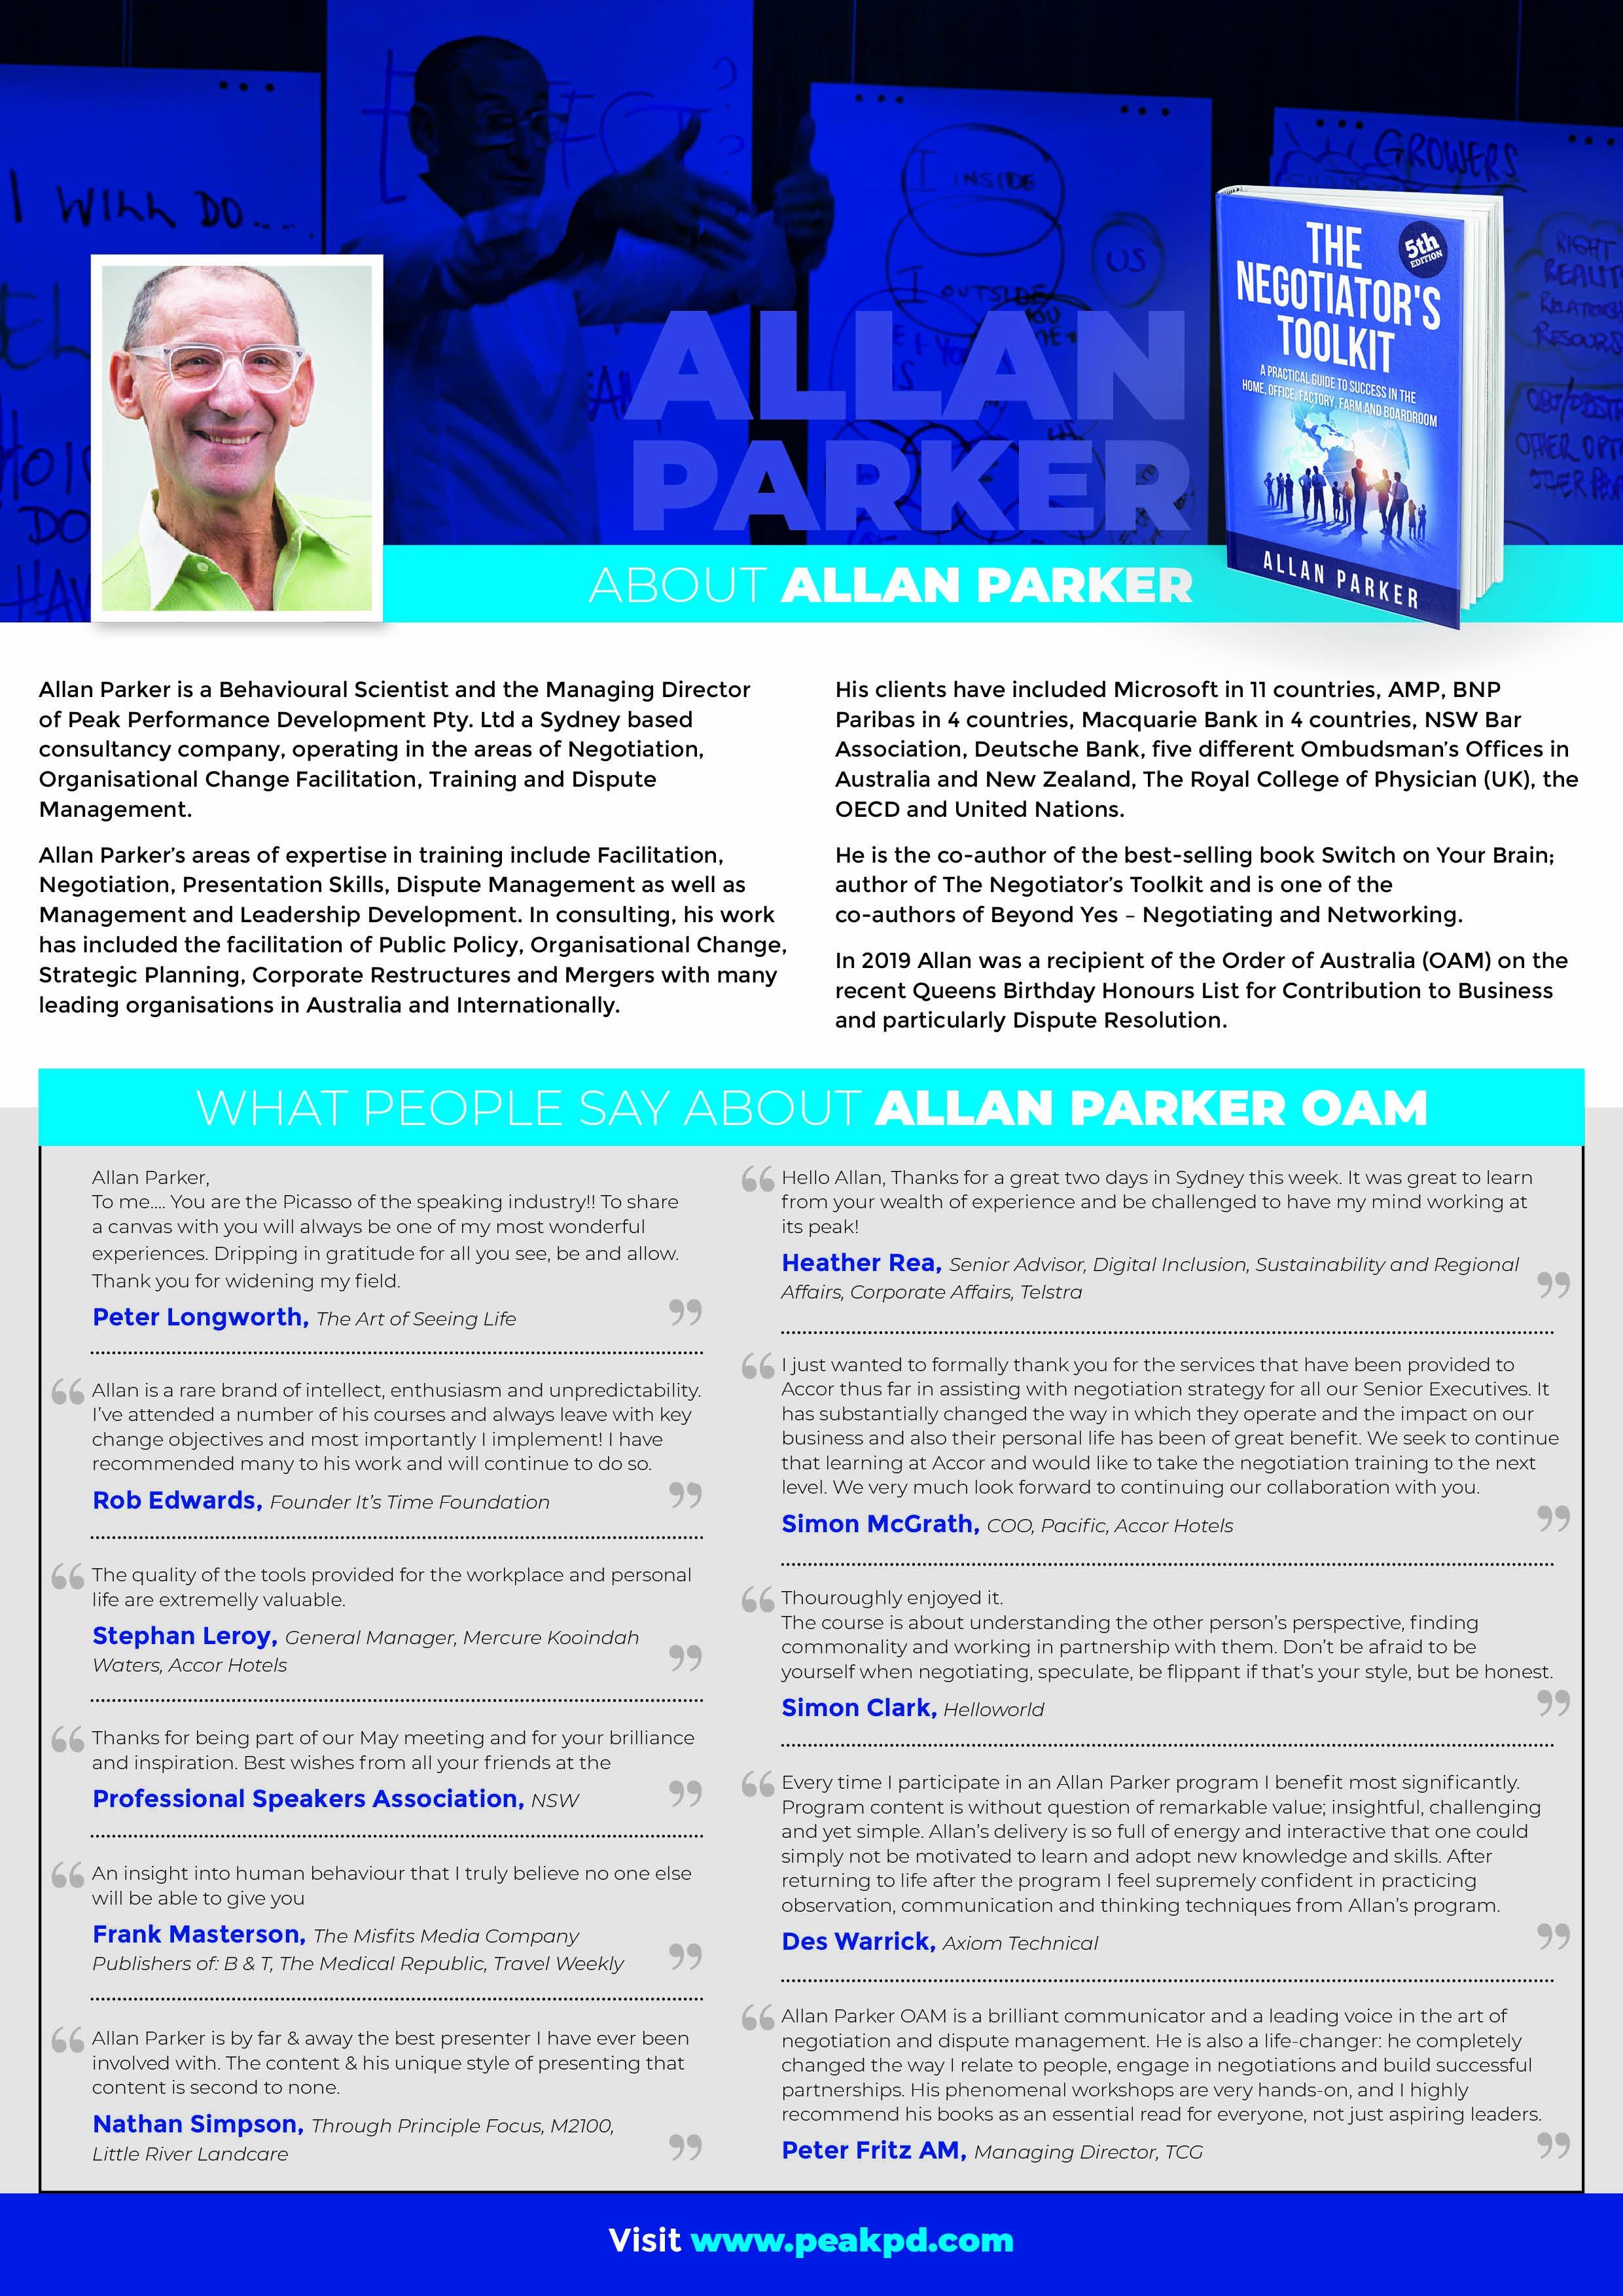 Allan Parkers Negotiation & Leadership Program